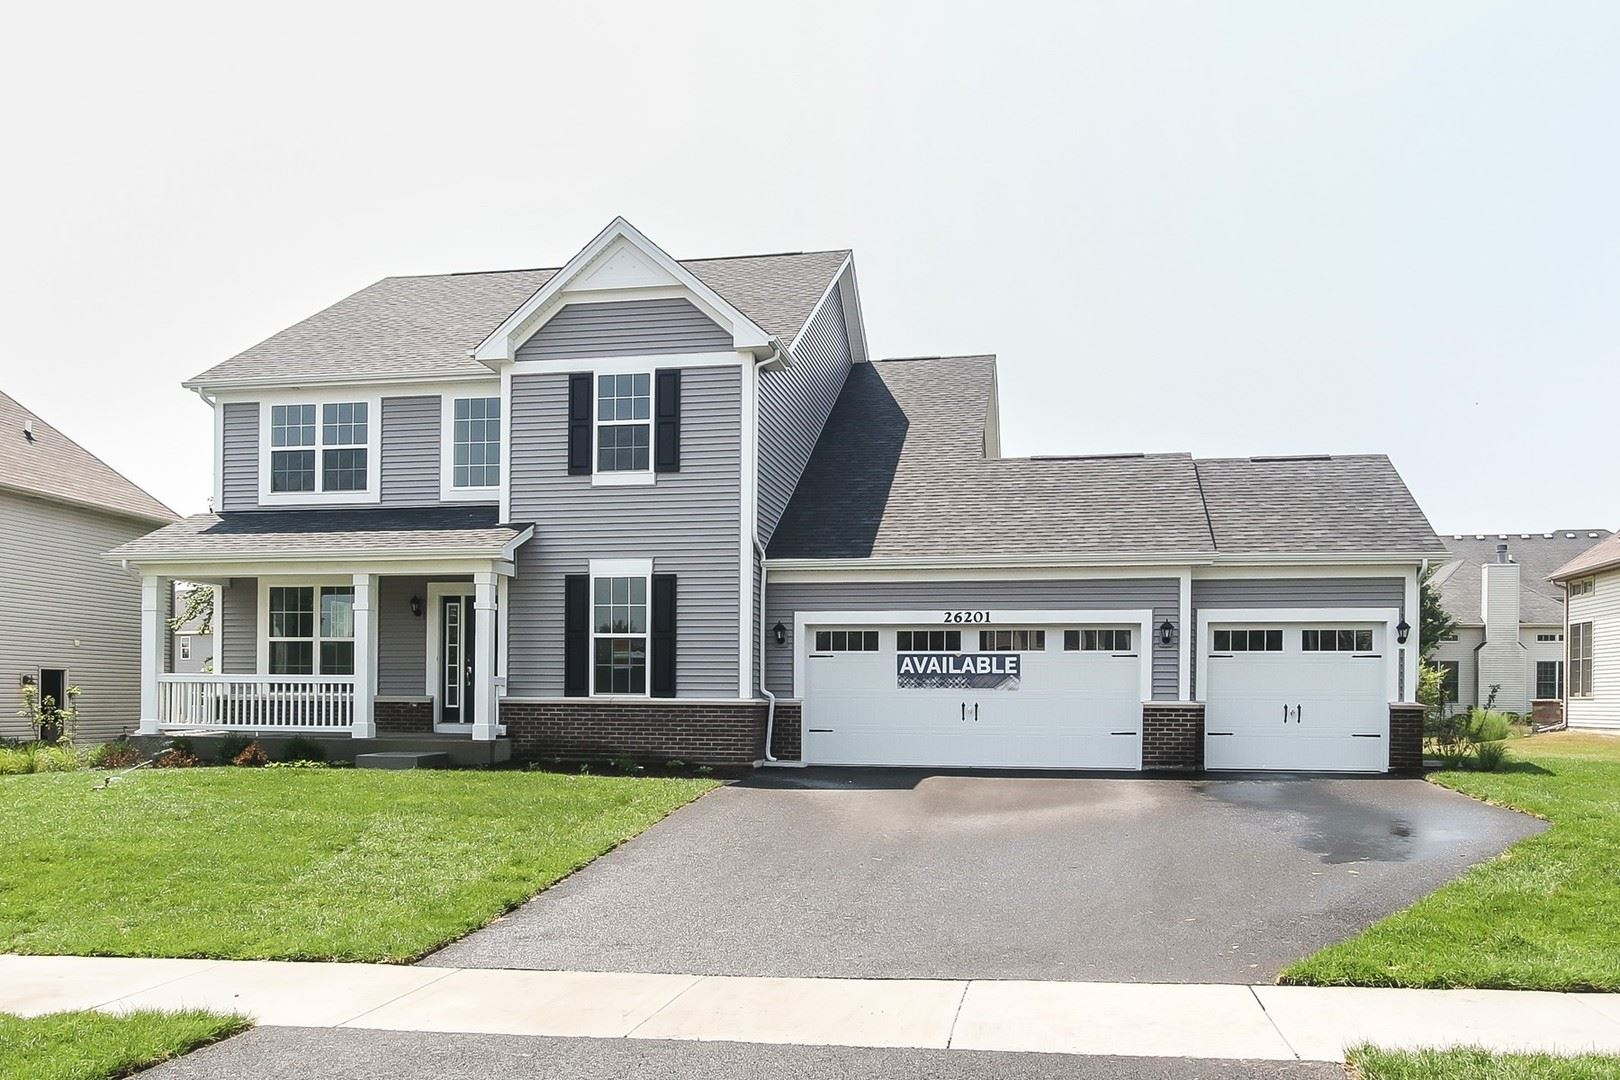 26210 W Chatham Lot#42 Drive, Plainfield, IL 60585 - #: 10705297